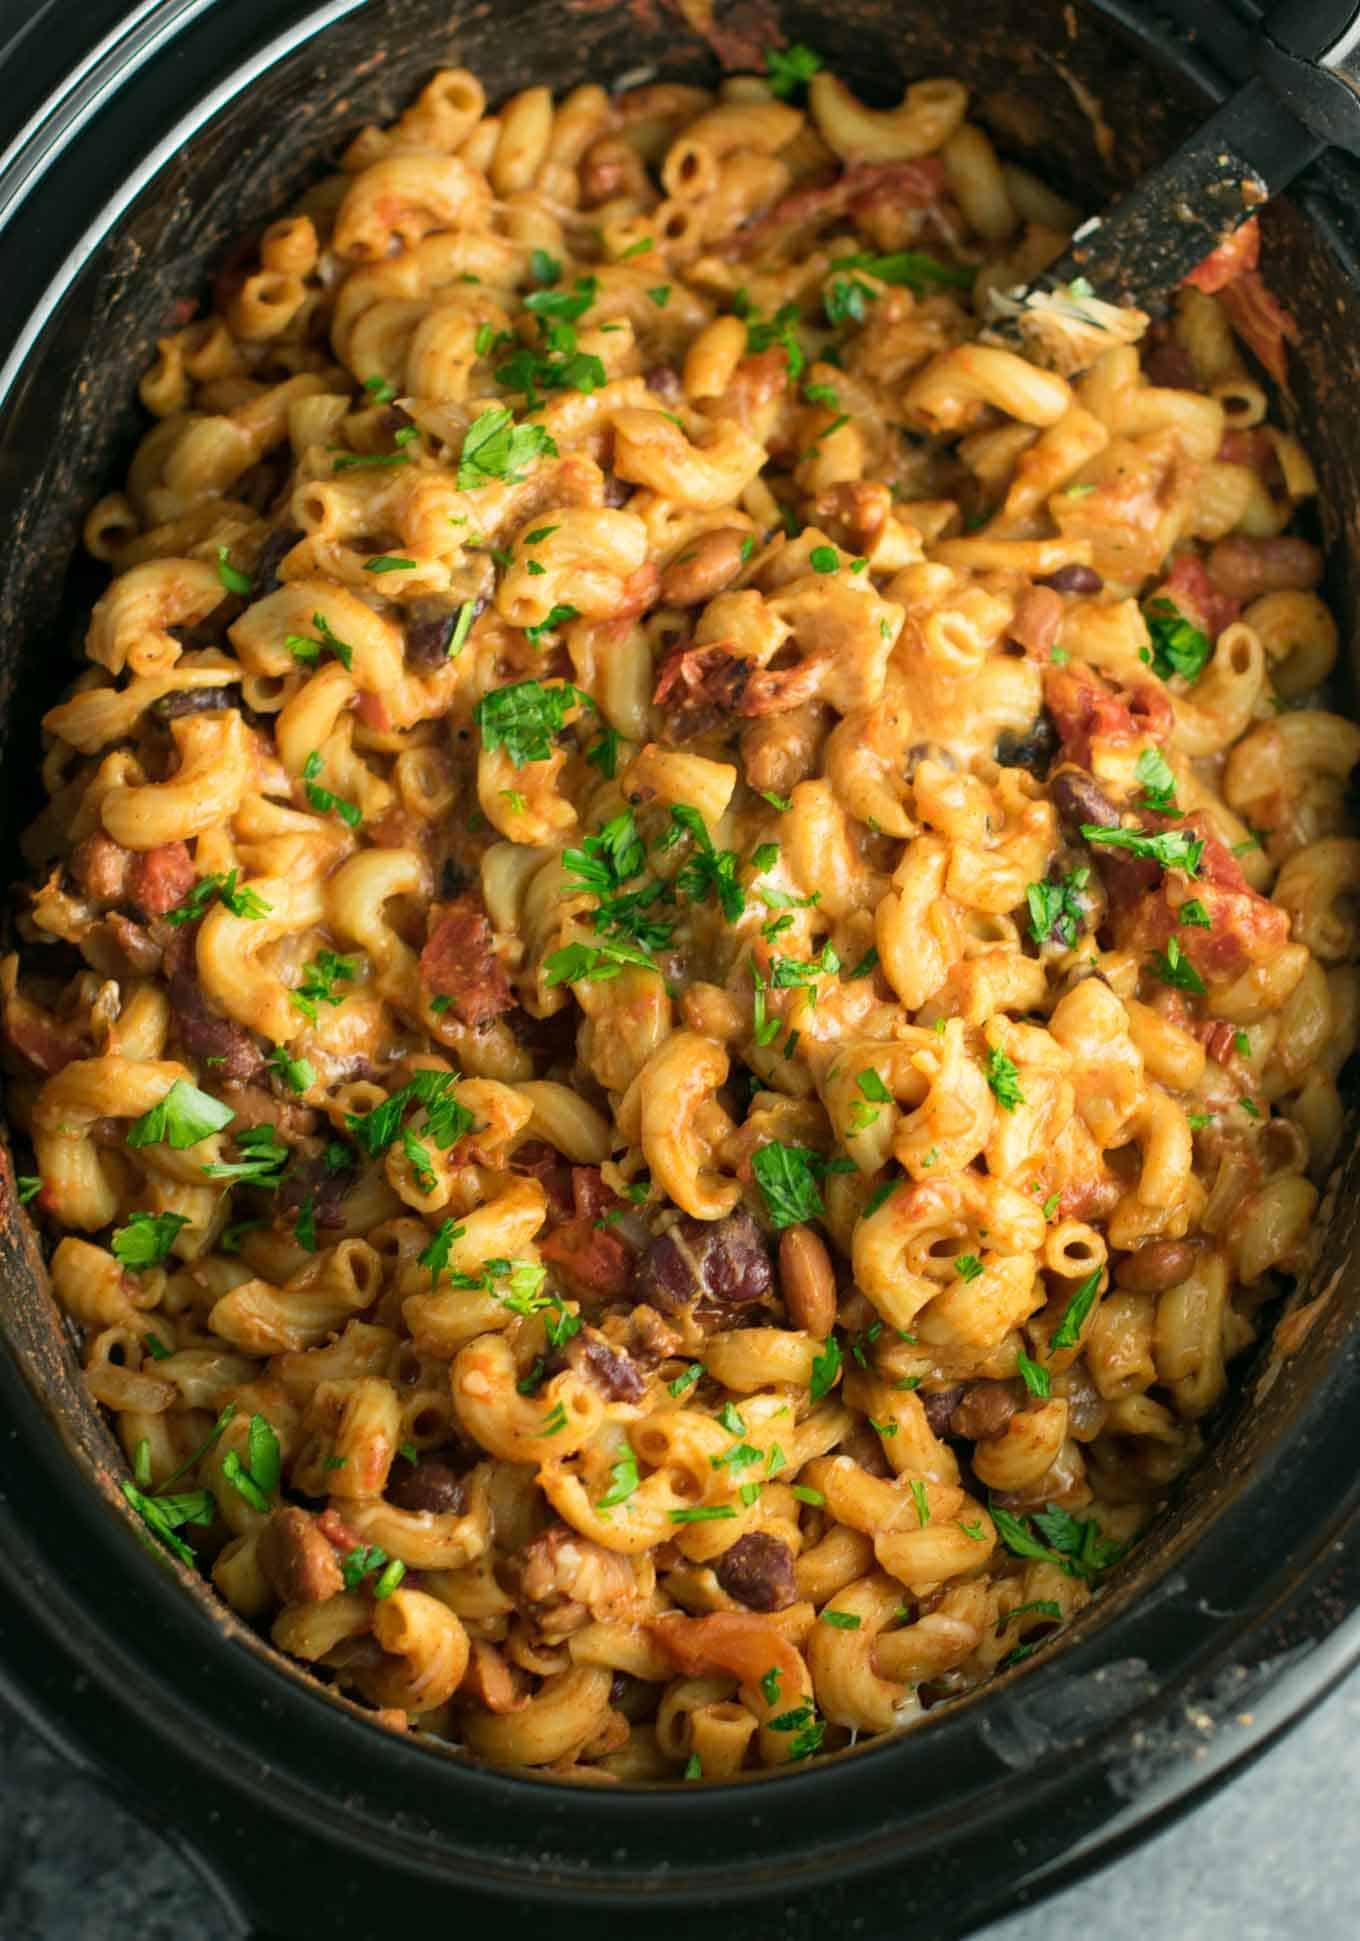 Crockpot Vegan Recipes  Slow Cooker Ve arian Chili Mac Recipe Build Your Bite